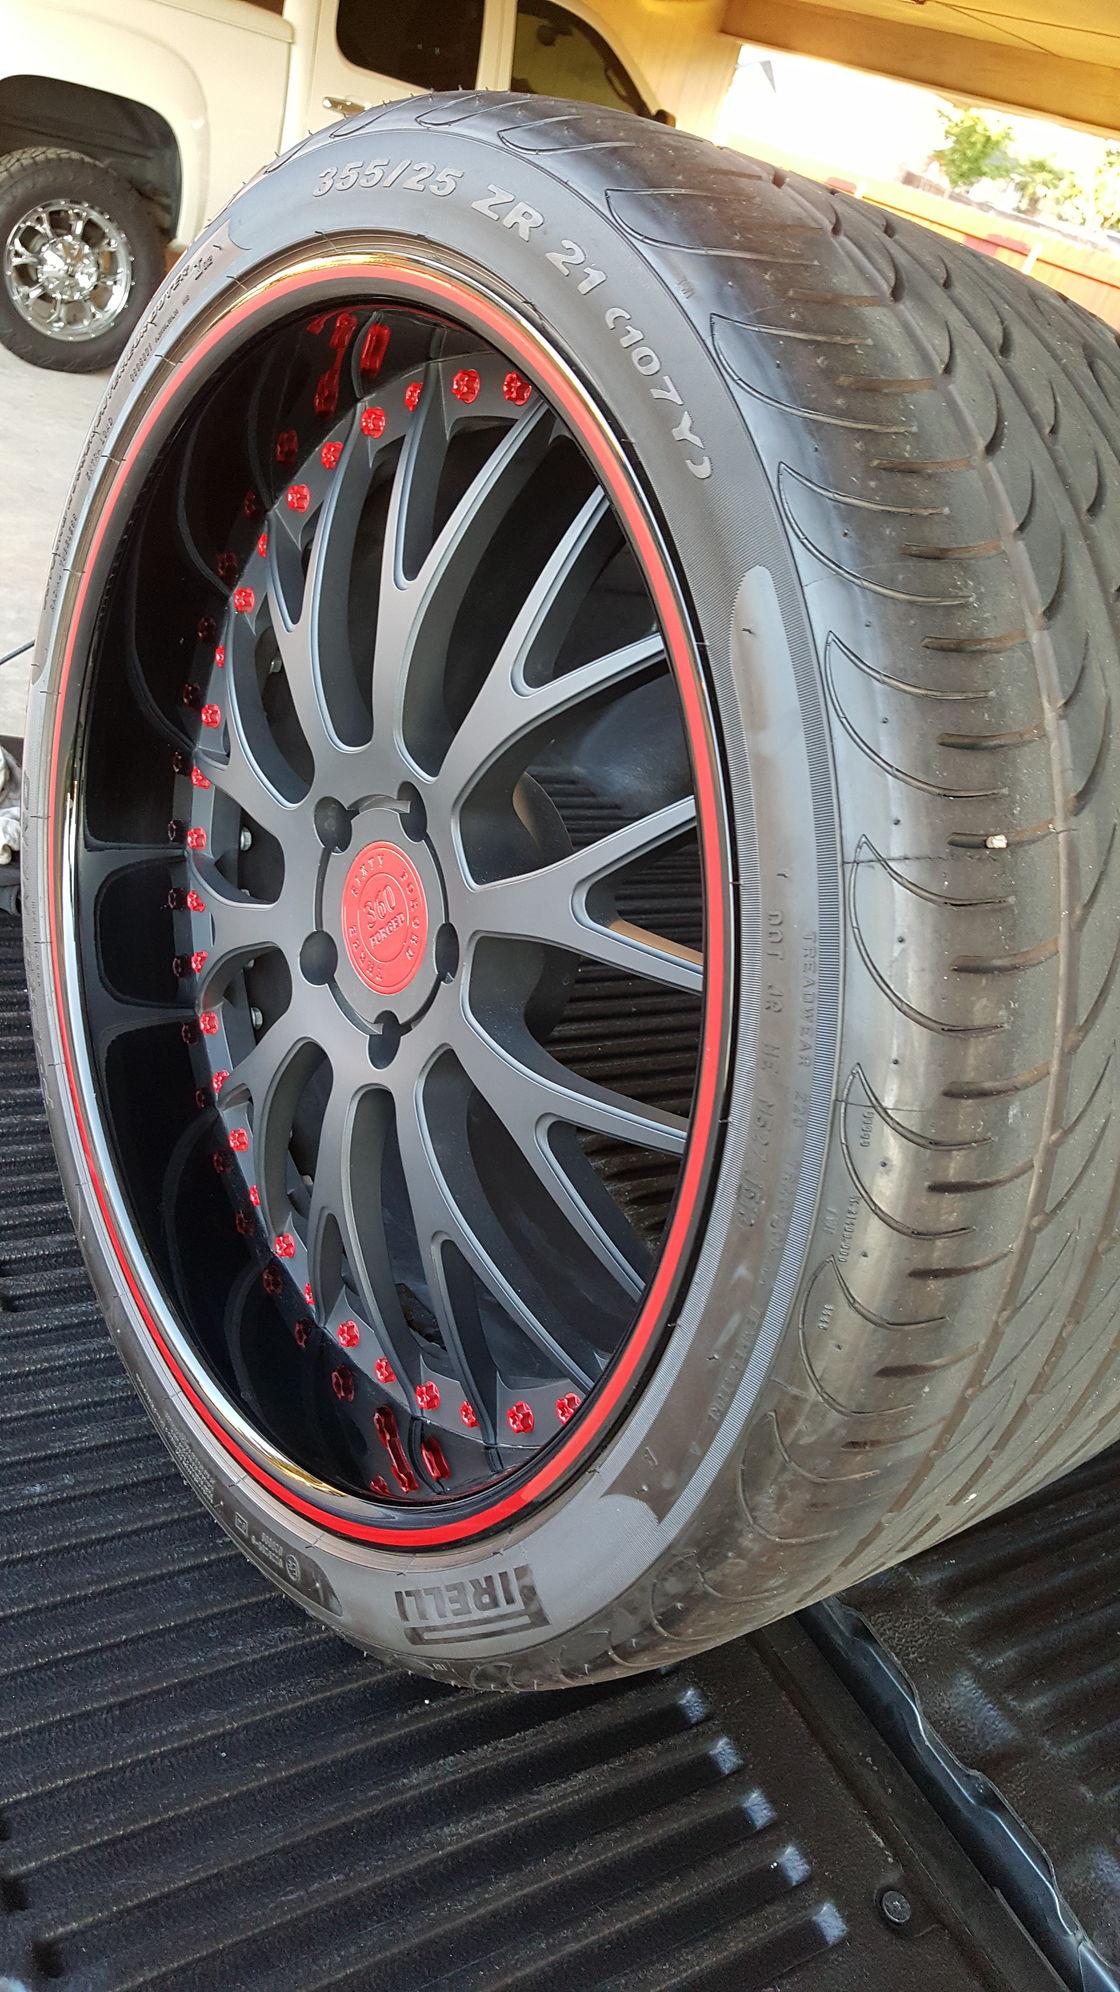 What Time Does Discount Tire Close >> 355/25zr21 Pirelli P Zero Nero - CorvetteForum - Chevrolet Corvette Forum Discussion